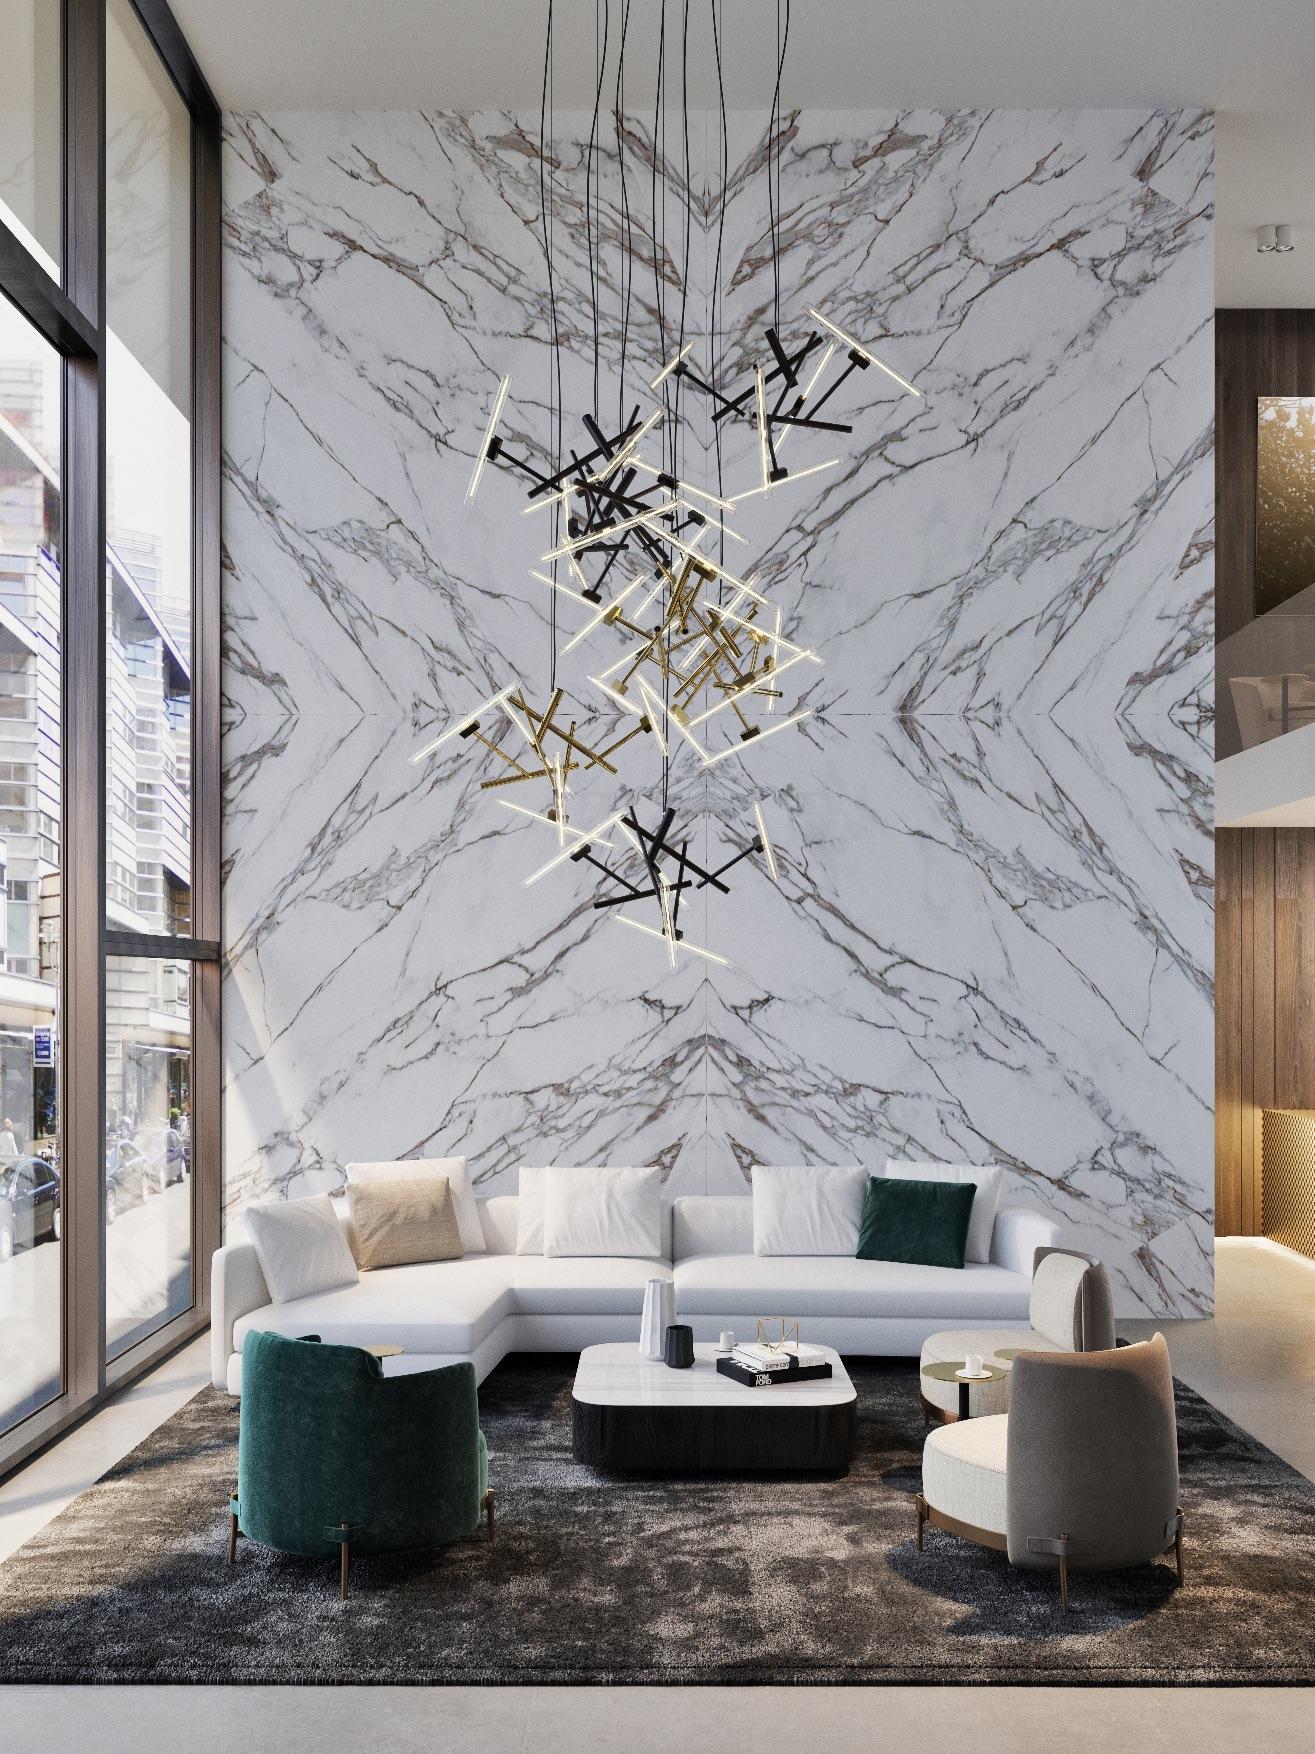 brandvanegmond_Linea-collection_element_lighting-composition_LINLT50_black-matt-finish_interior